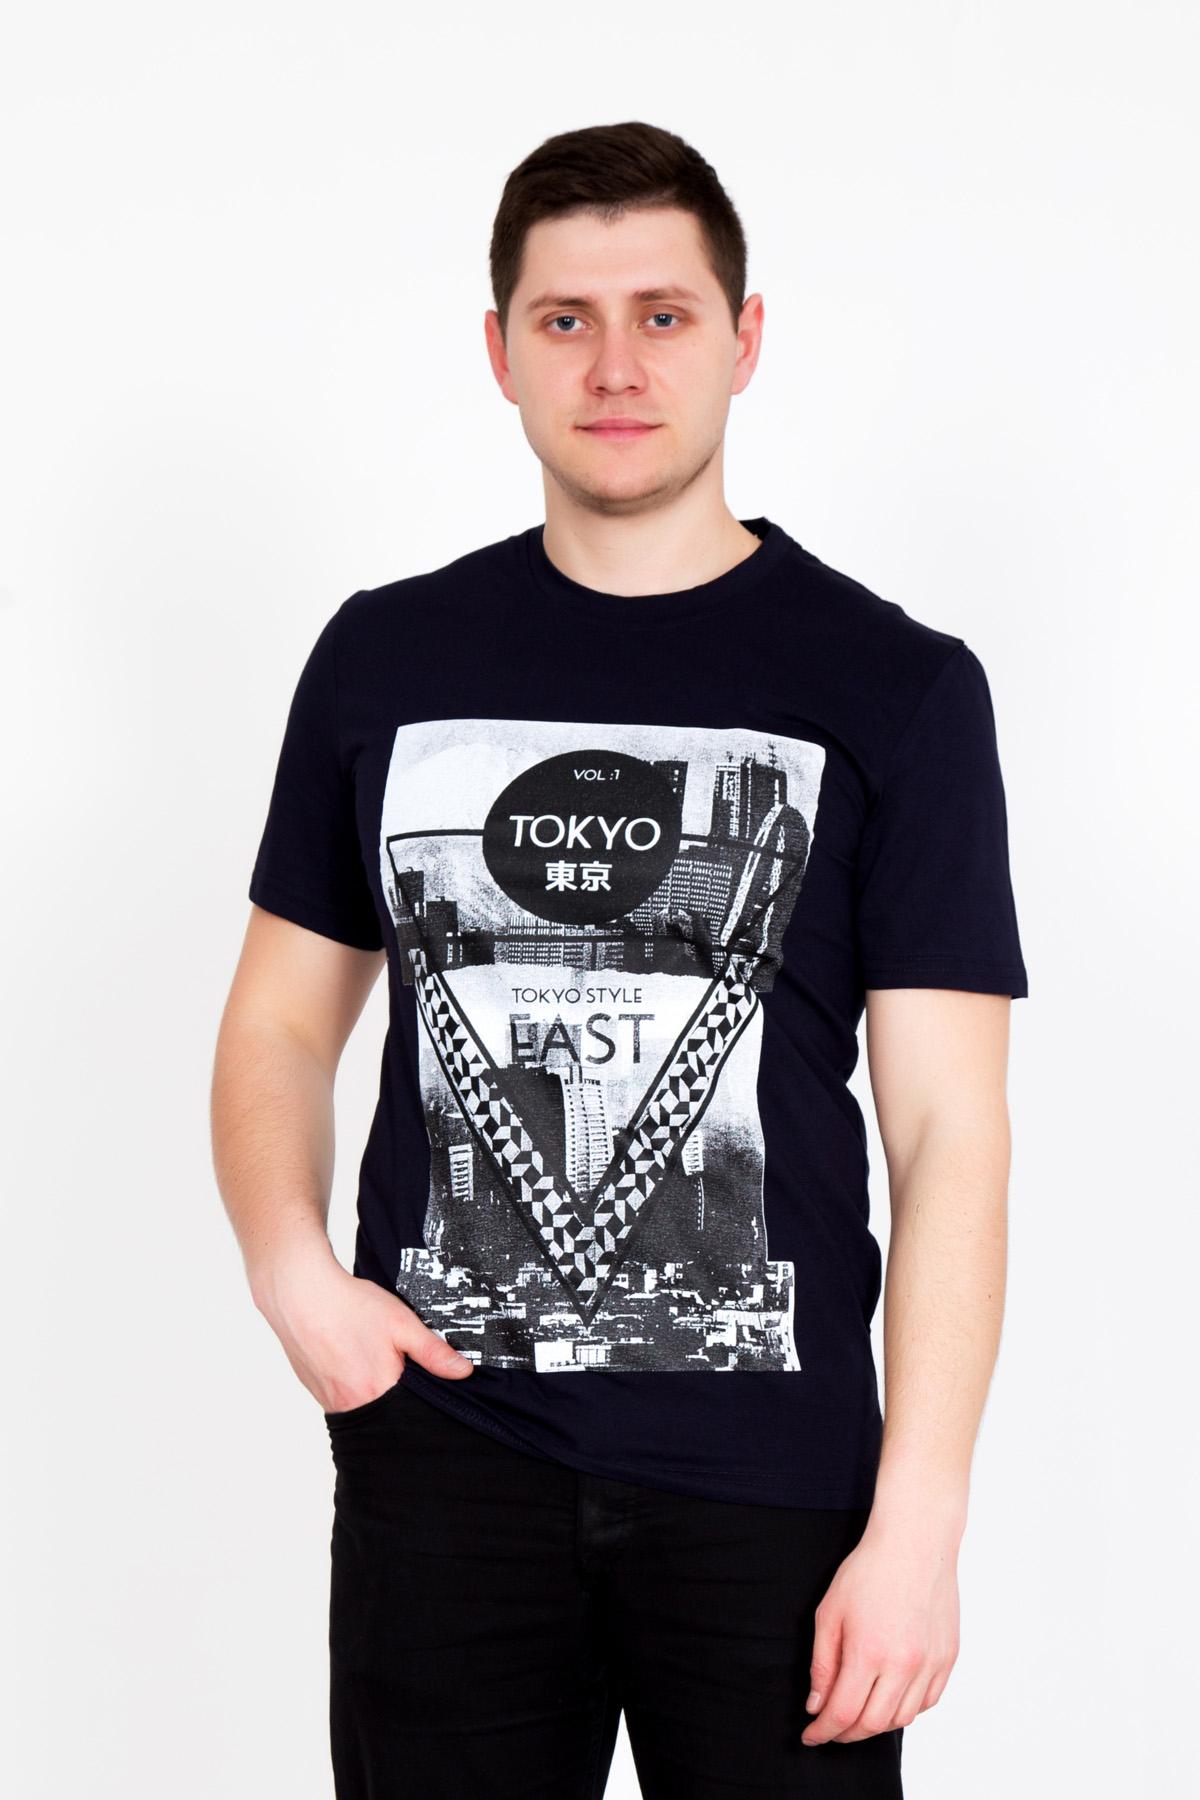 Муж. футболка  Токио  Черный р. 54 - Мужская одежда артикул: 25584